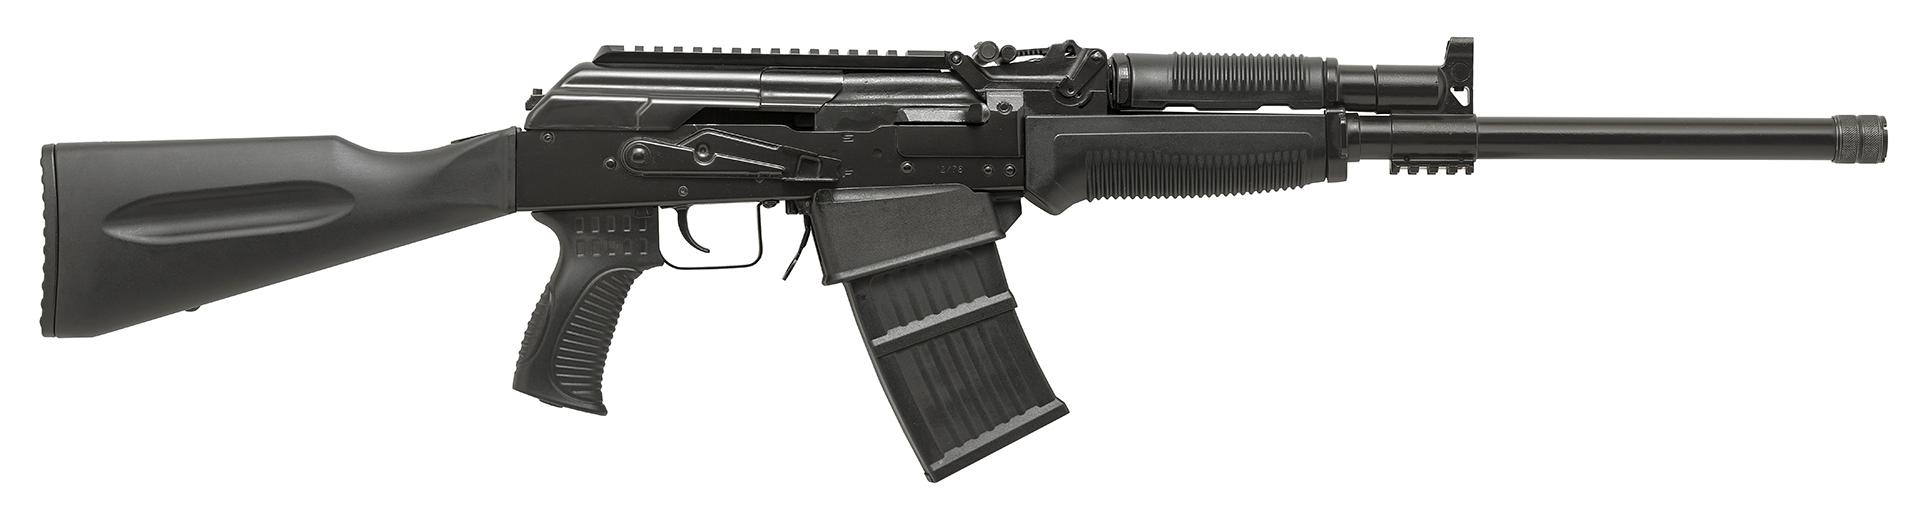 FD 12 - MT Shotgun Image